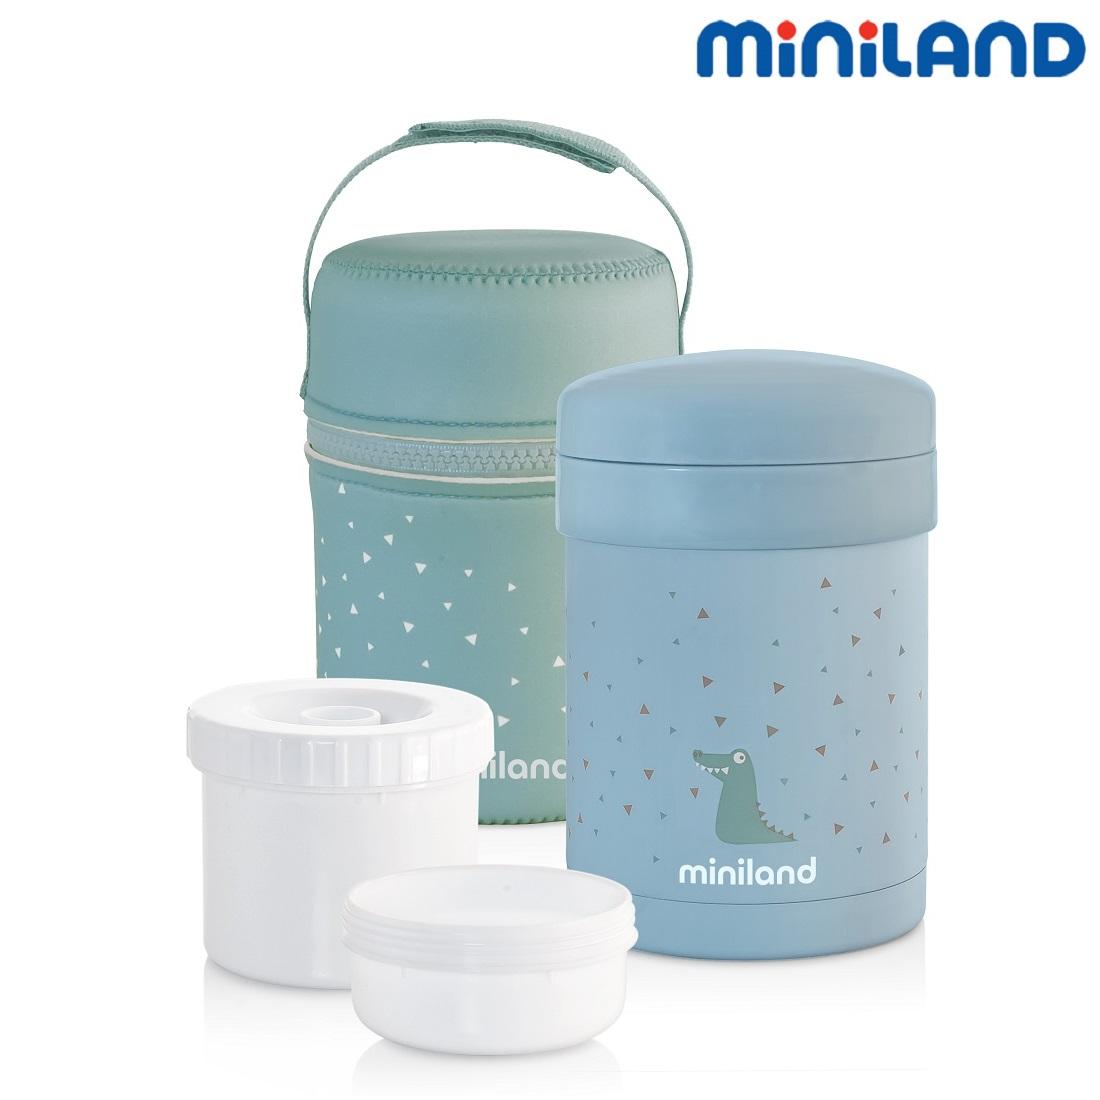 Termo madkasse Miniland Thermetic lyseblå